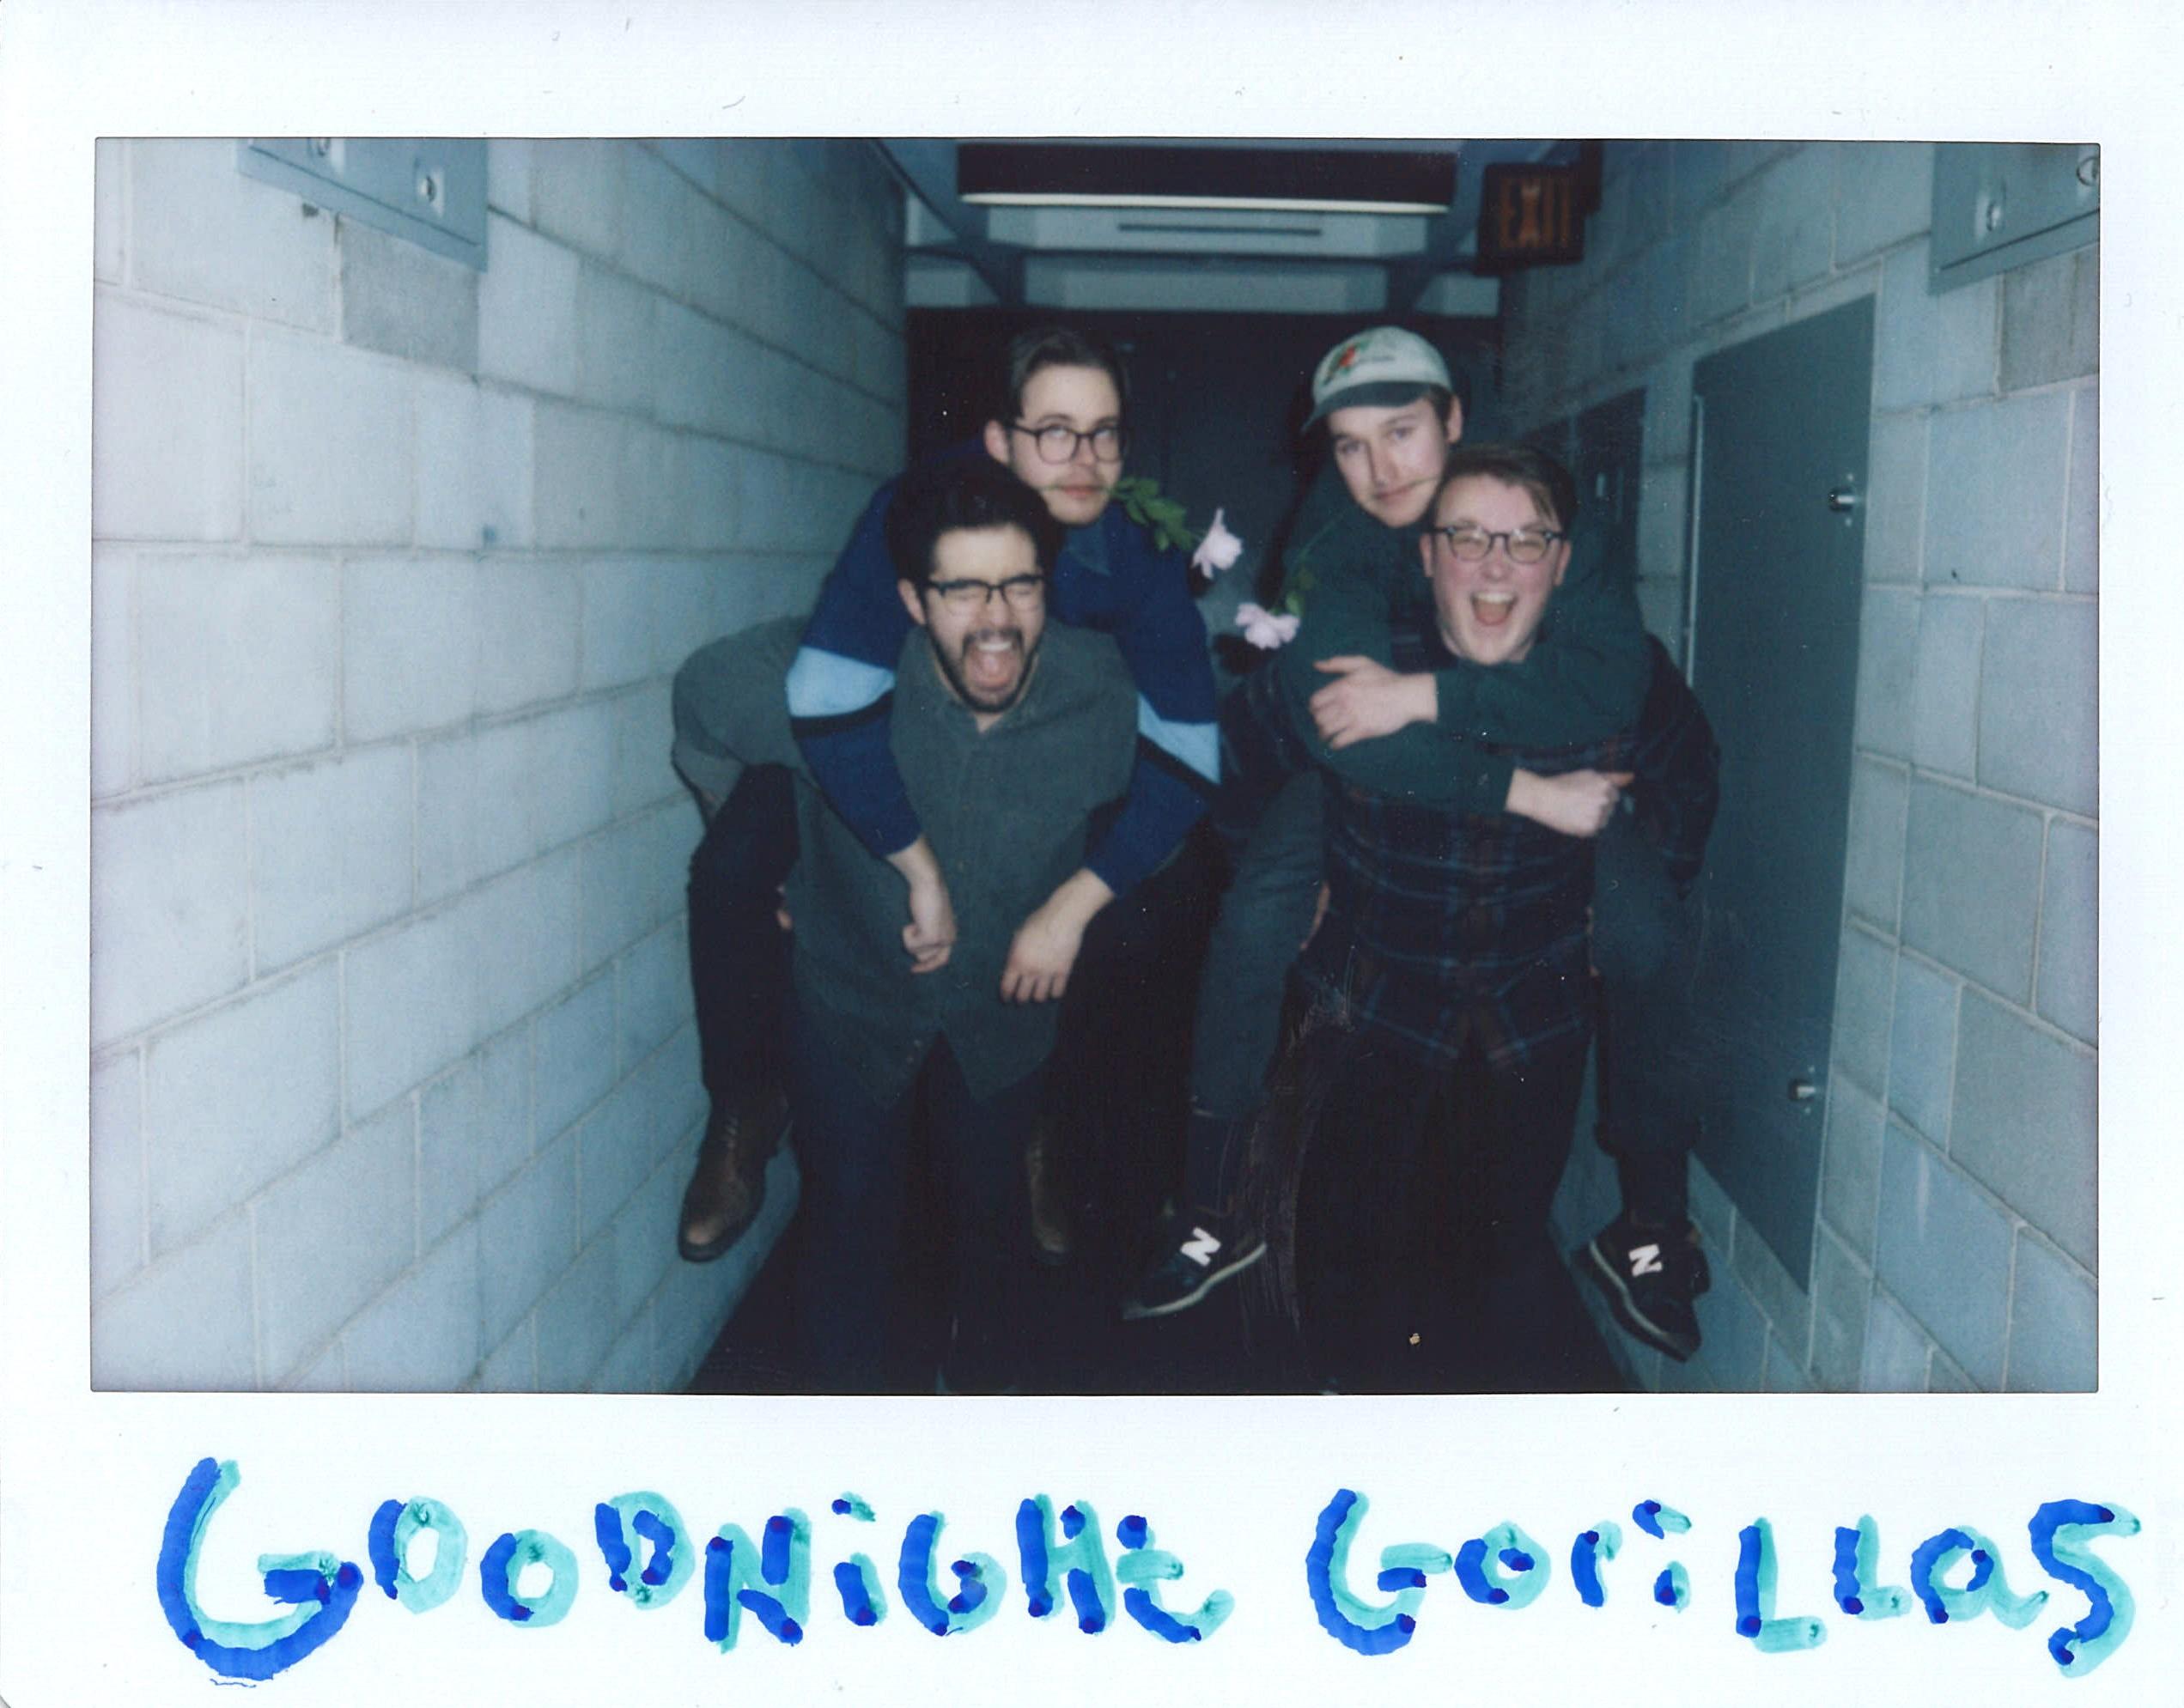 Goodnight Gorillas